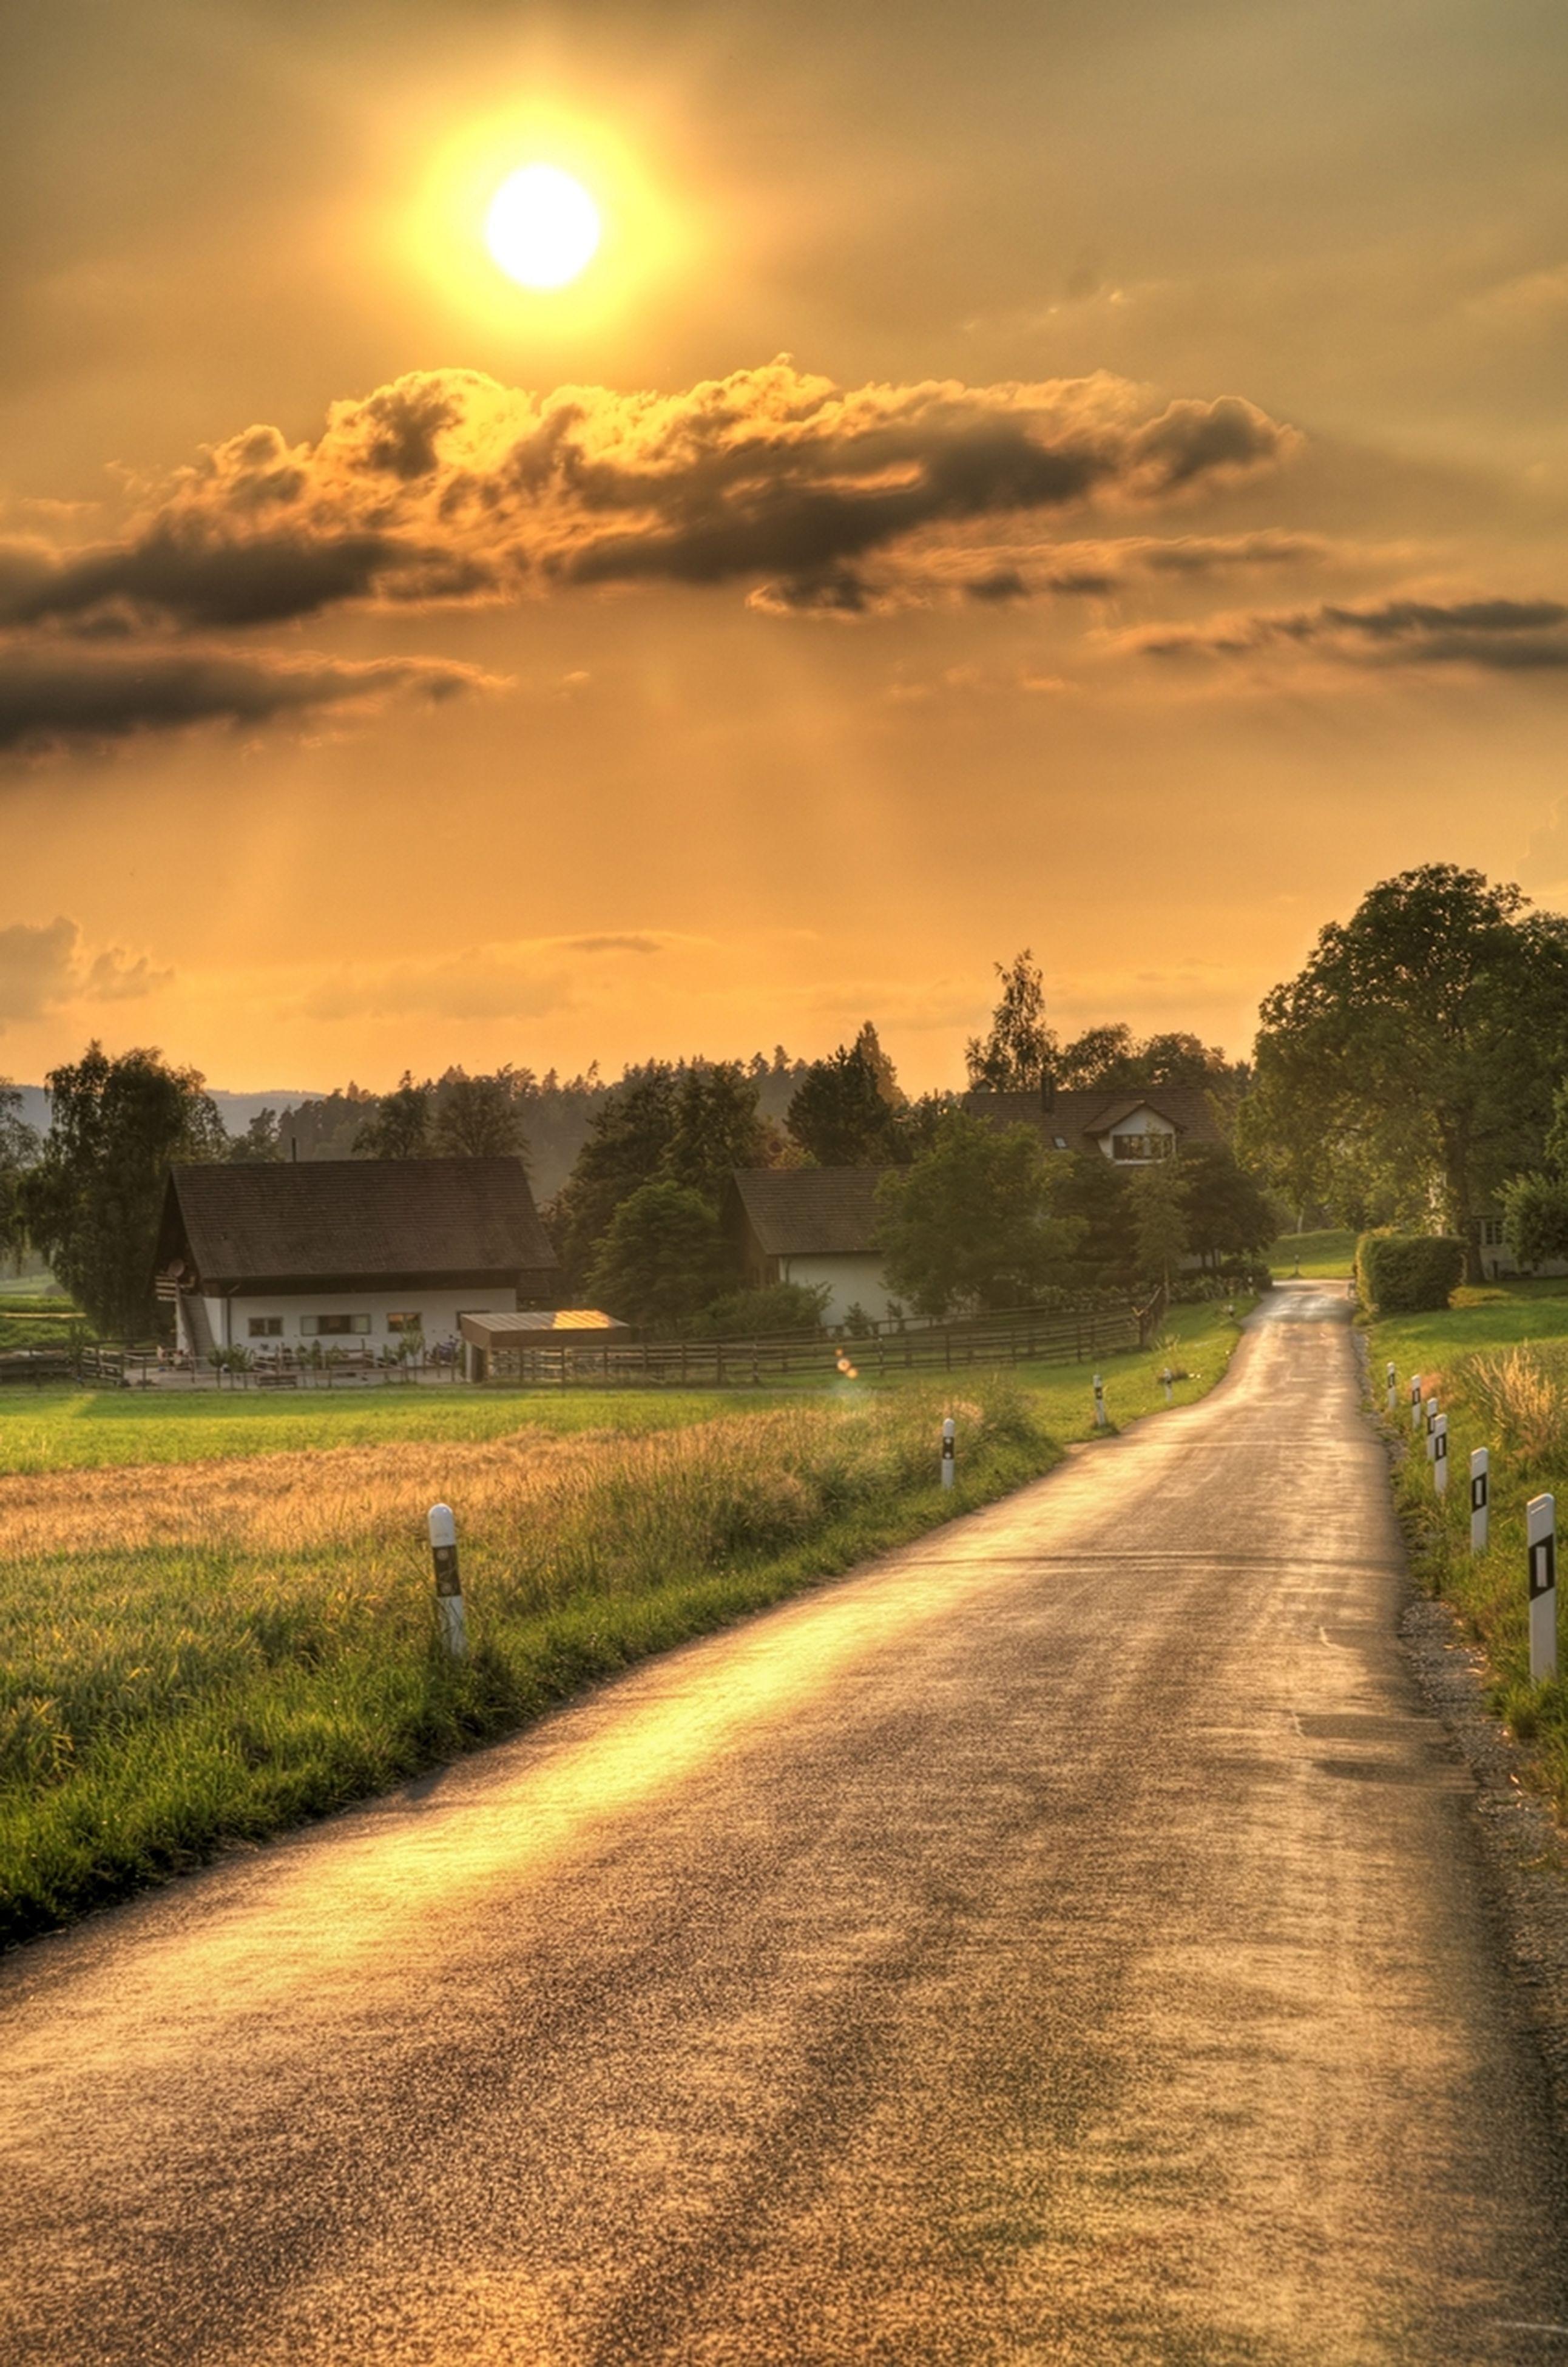 sunset, sky, the way forward, grass, field, sun, tree, landscape, cloud - sky, tranquility, tranquil scene, diminishing perspective, road, sunlight, nature, rural scene, vanishing point, scenics, beauty in nature, sunbeam